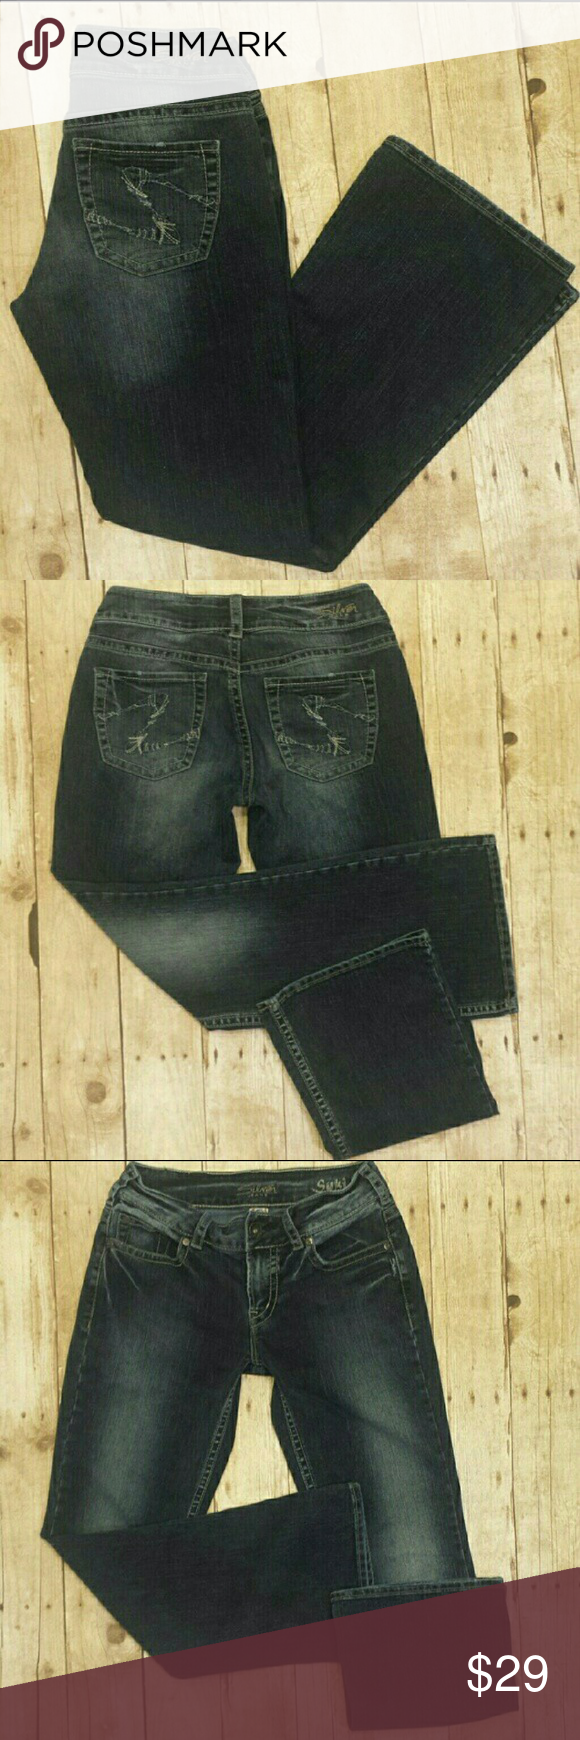 Silver Jeans Suki Stretch Bootcut Size 28 | Abbronzature, Jeans ...